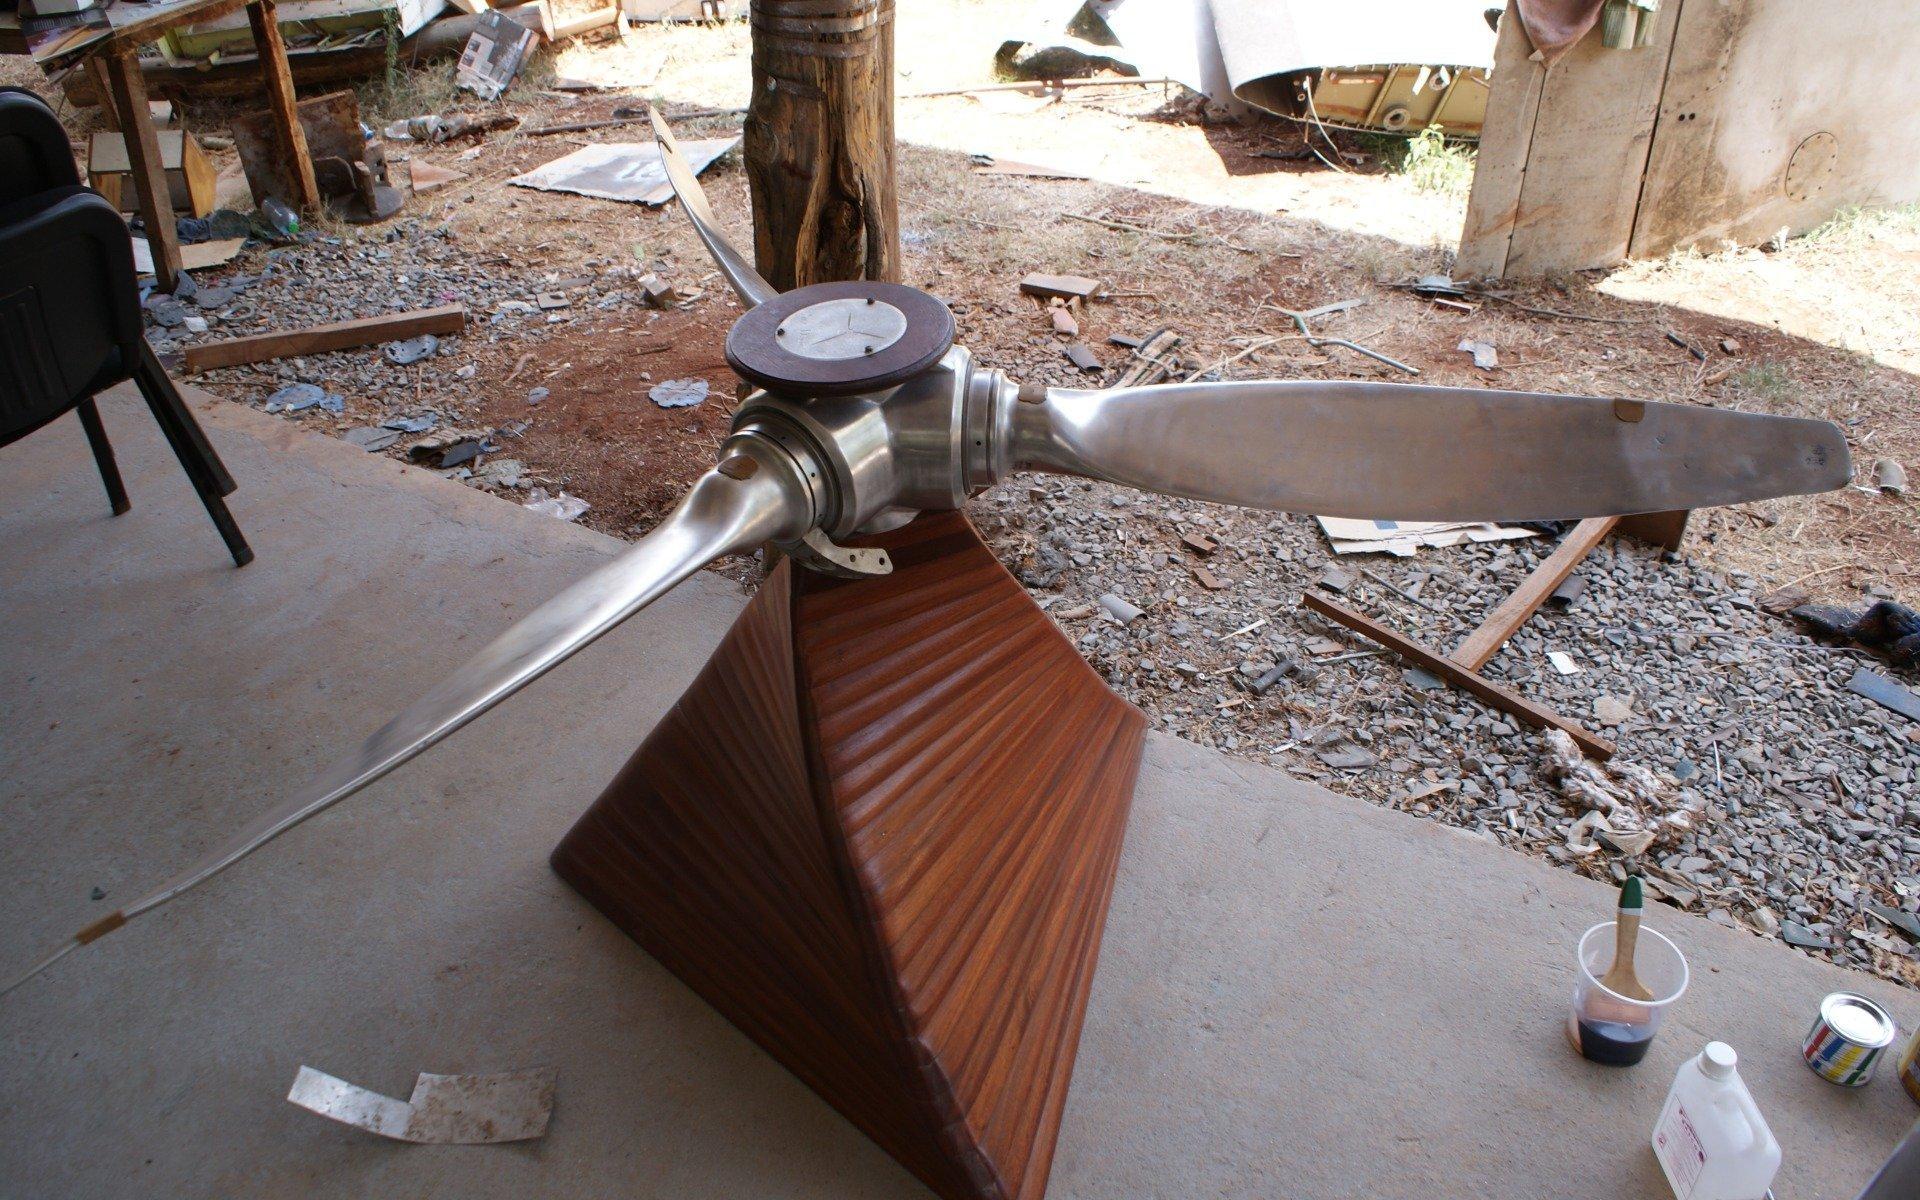 The hummingbird coffee table under construction at the Sky Decor Karen workshop.